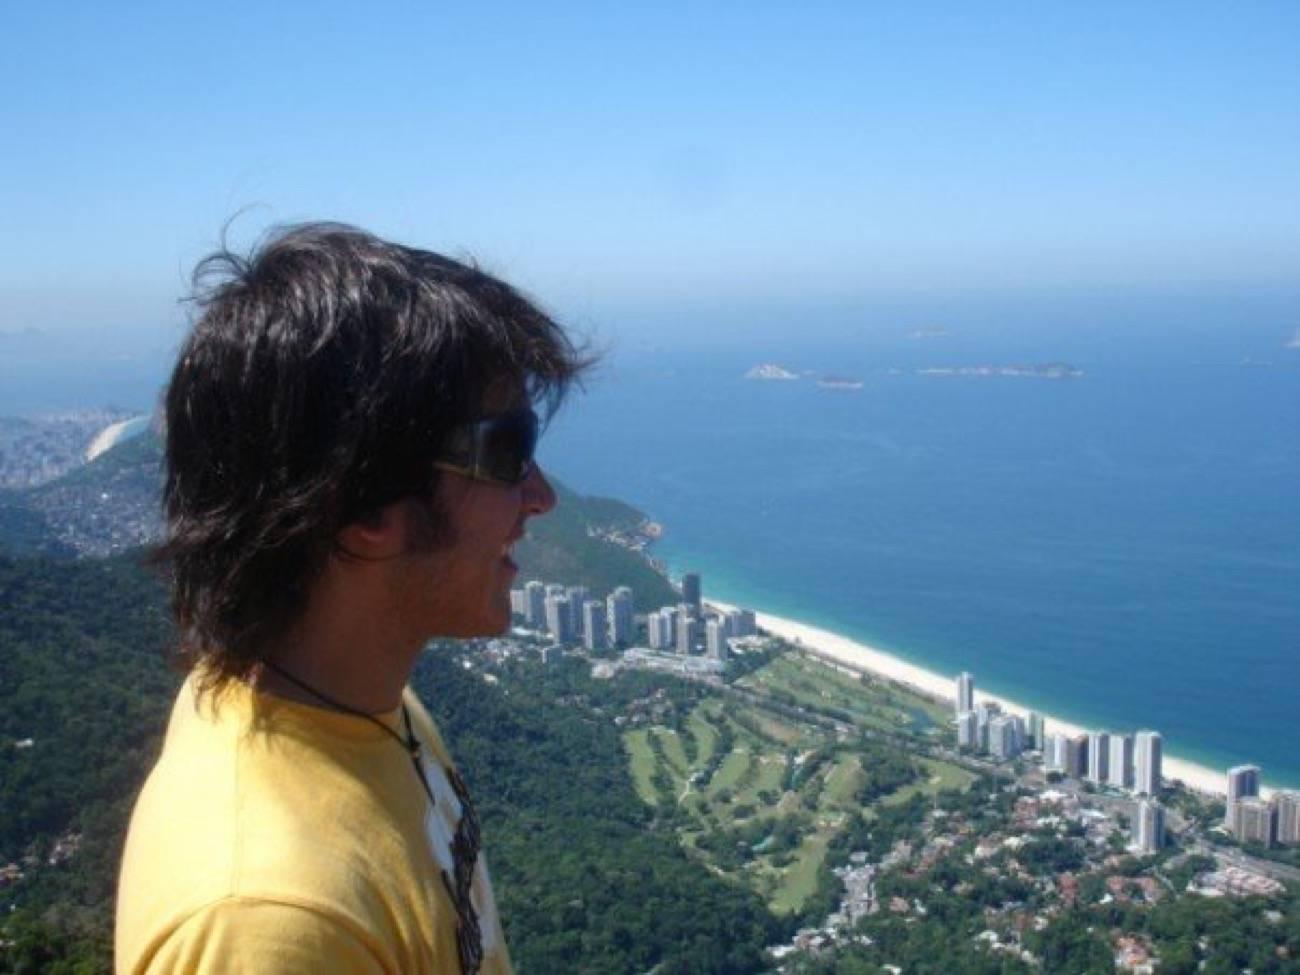 viajero o turista desde las alturas